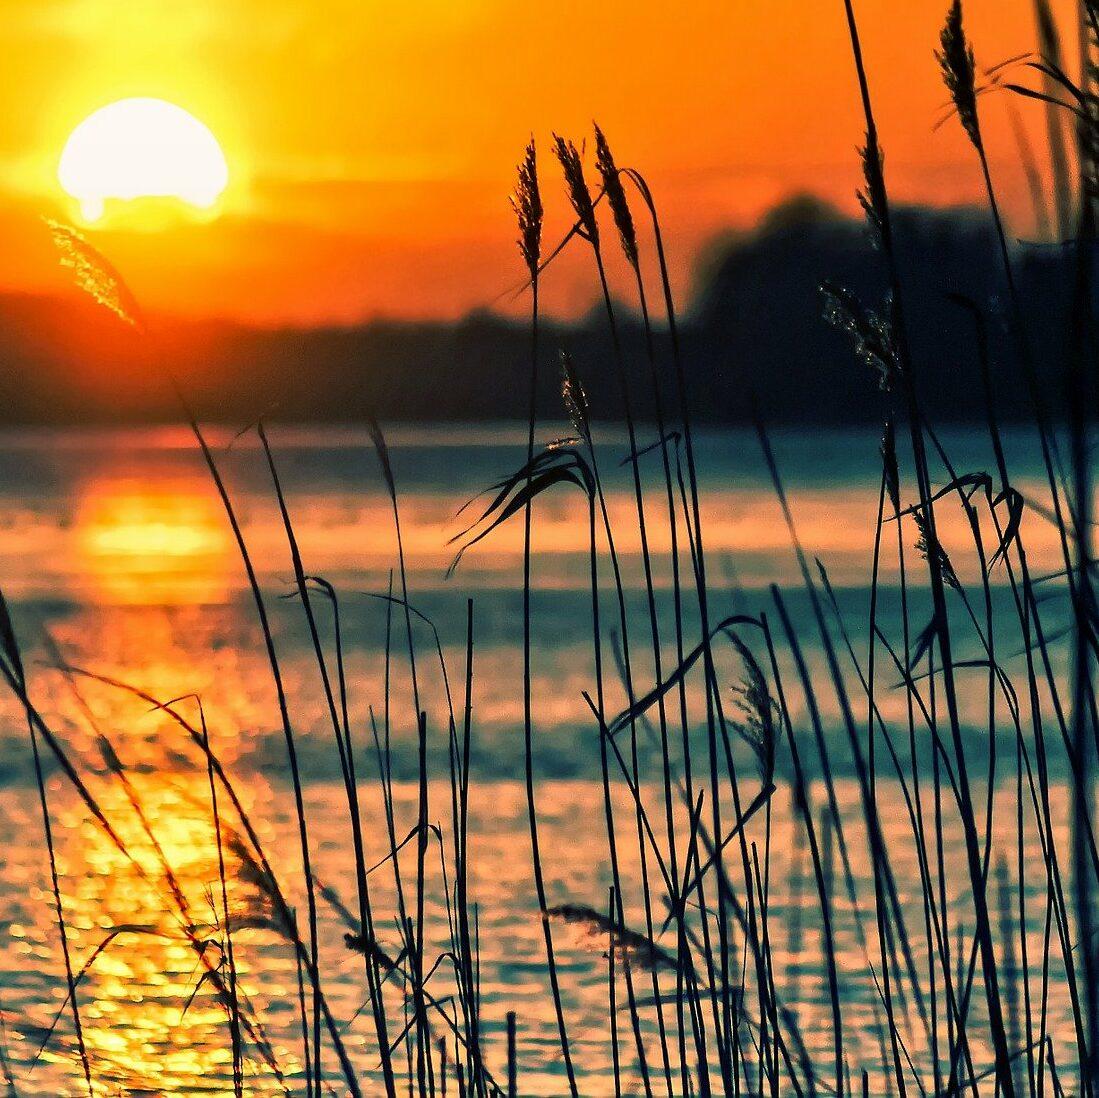 vand solnedgang kvadrat e1612622448804